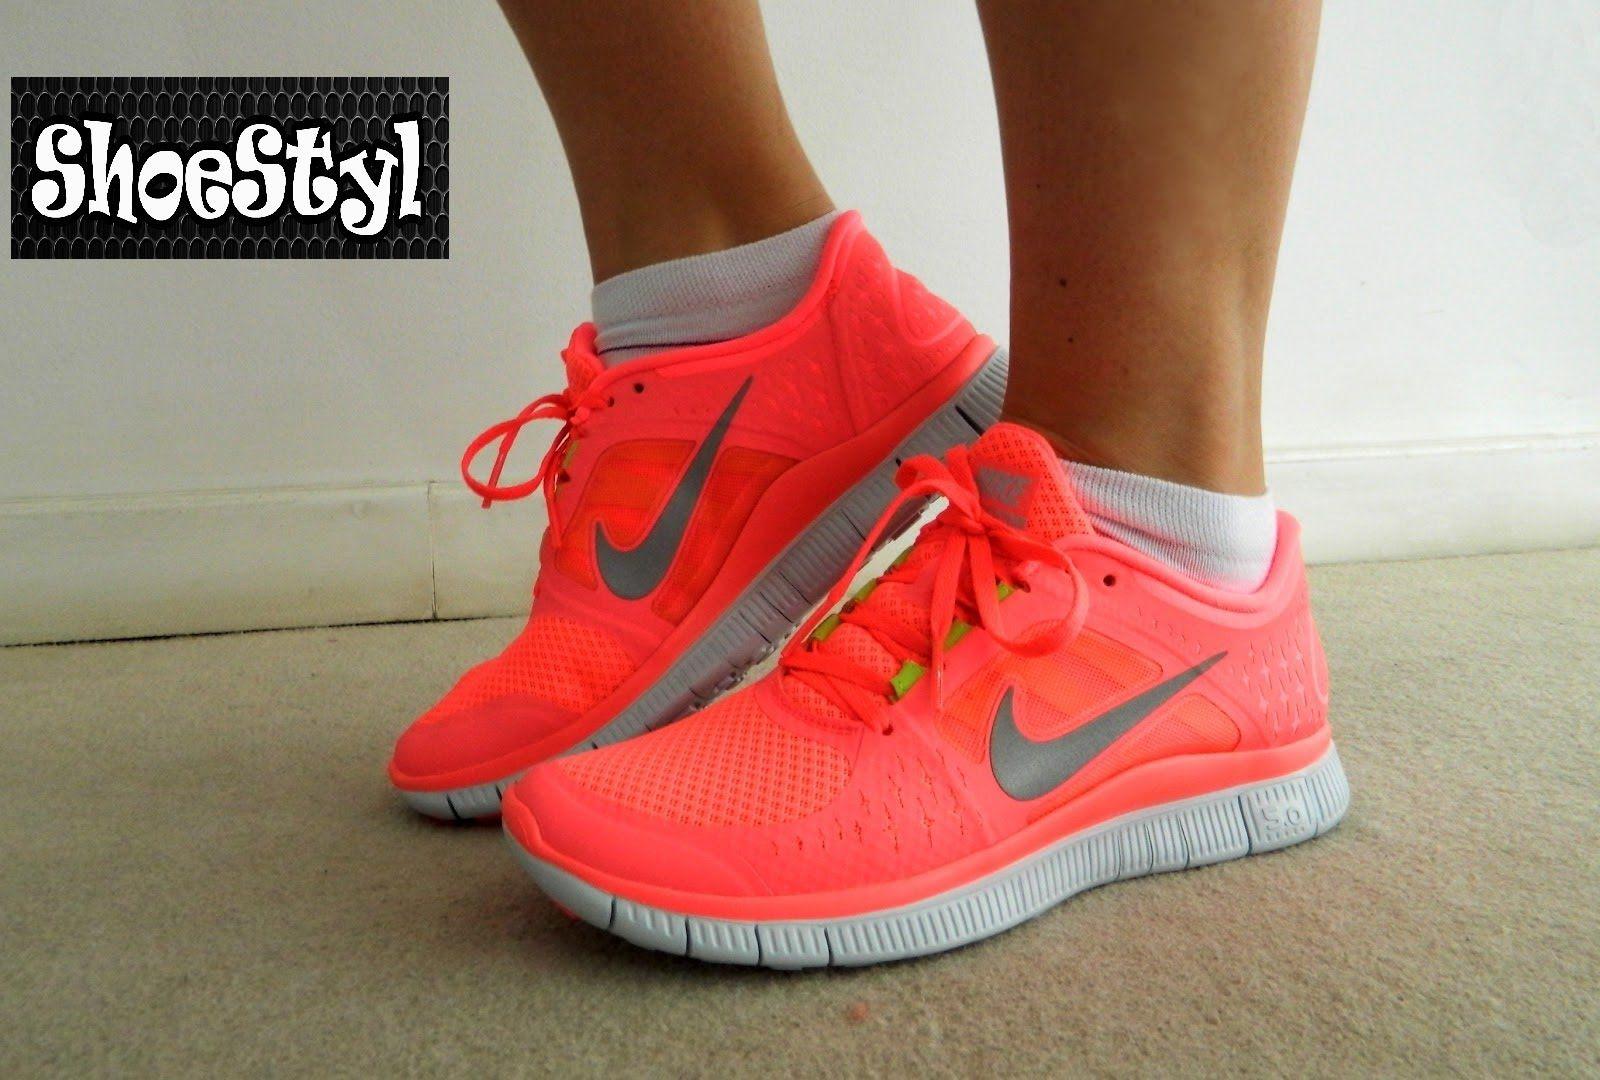 nike free run 5.0 womens running shoe